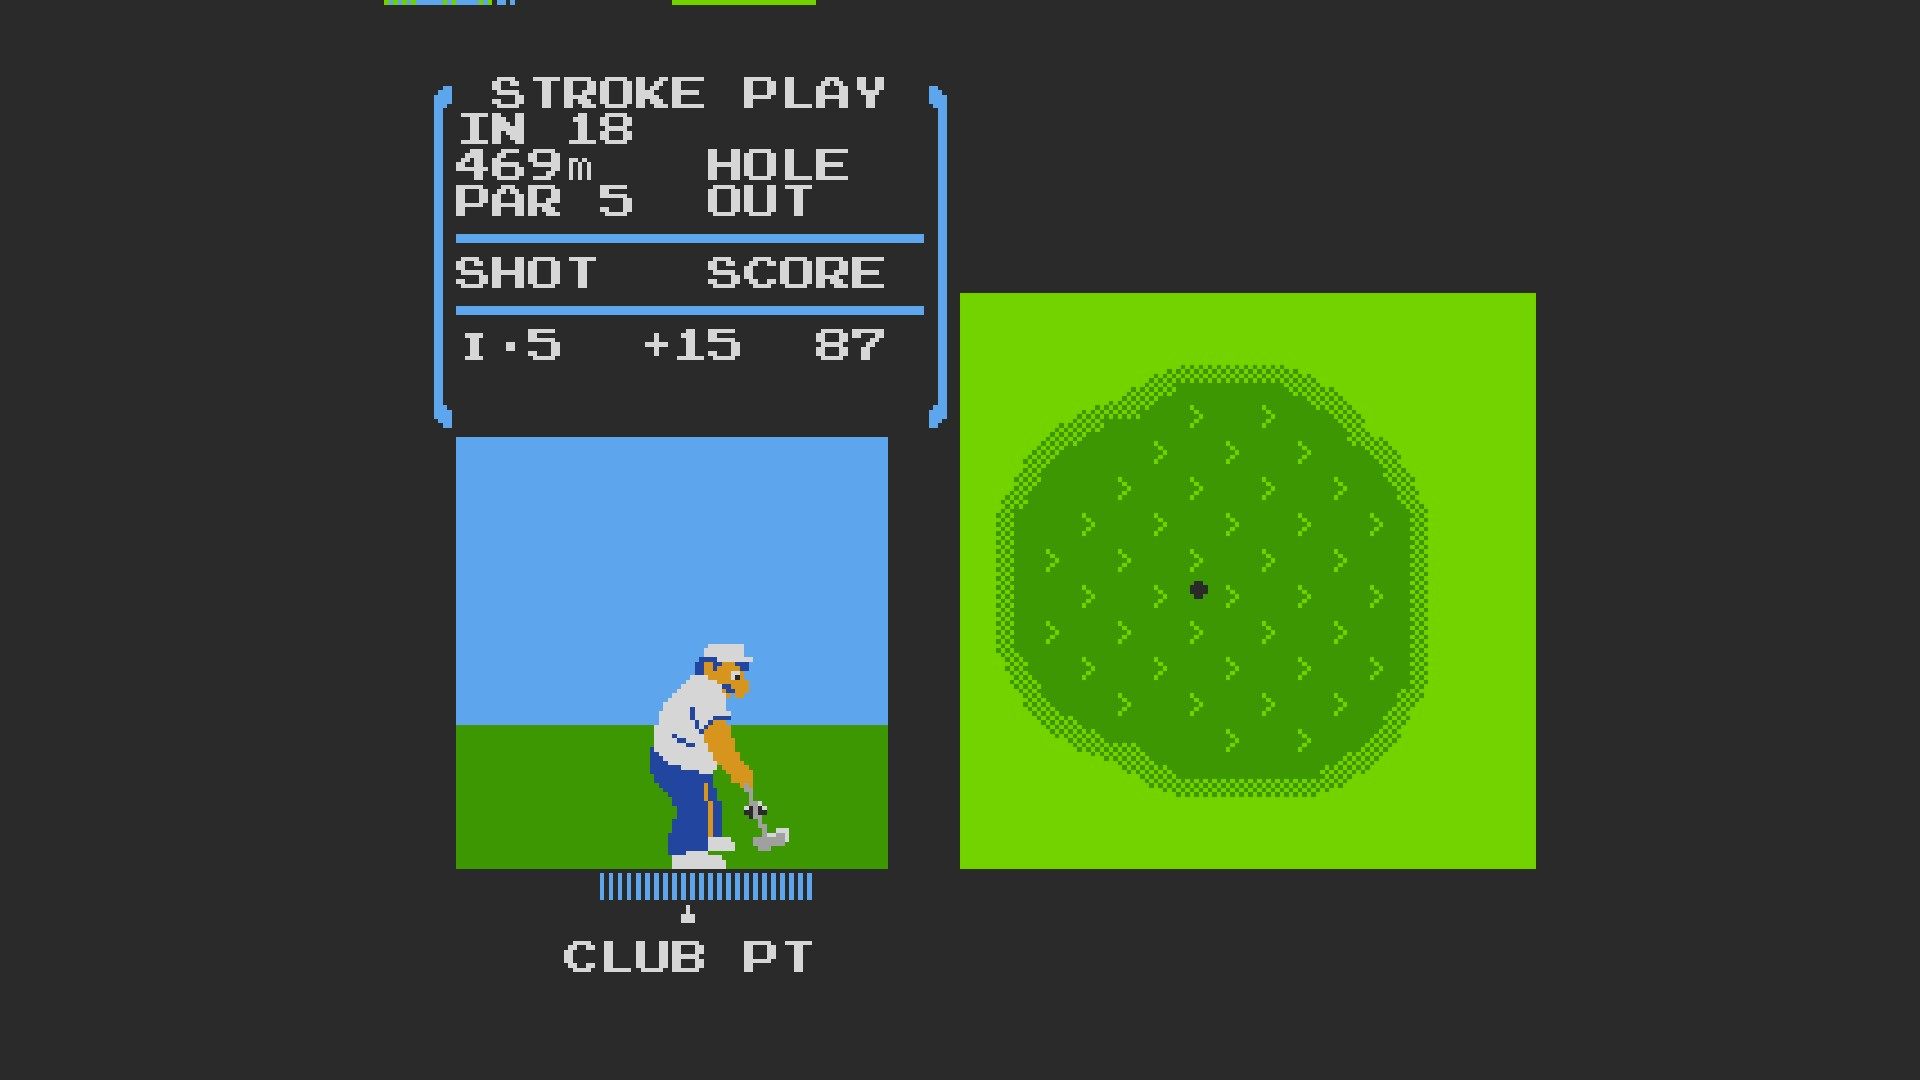 AkinNahtanoj: Golf [Single player stroke play] (NES/Famicom Emulated) 87 points on 2020-09-23 06:27:31